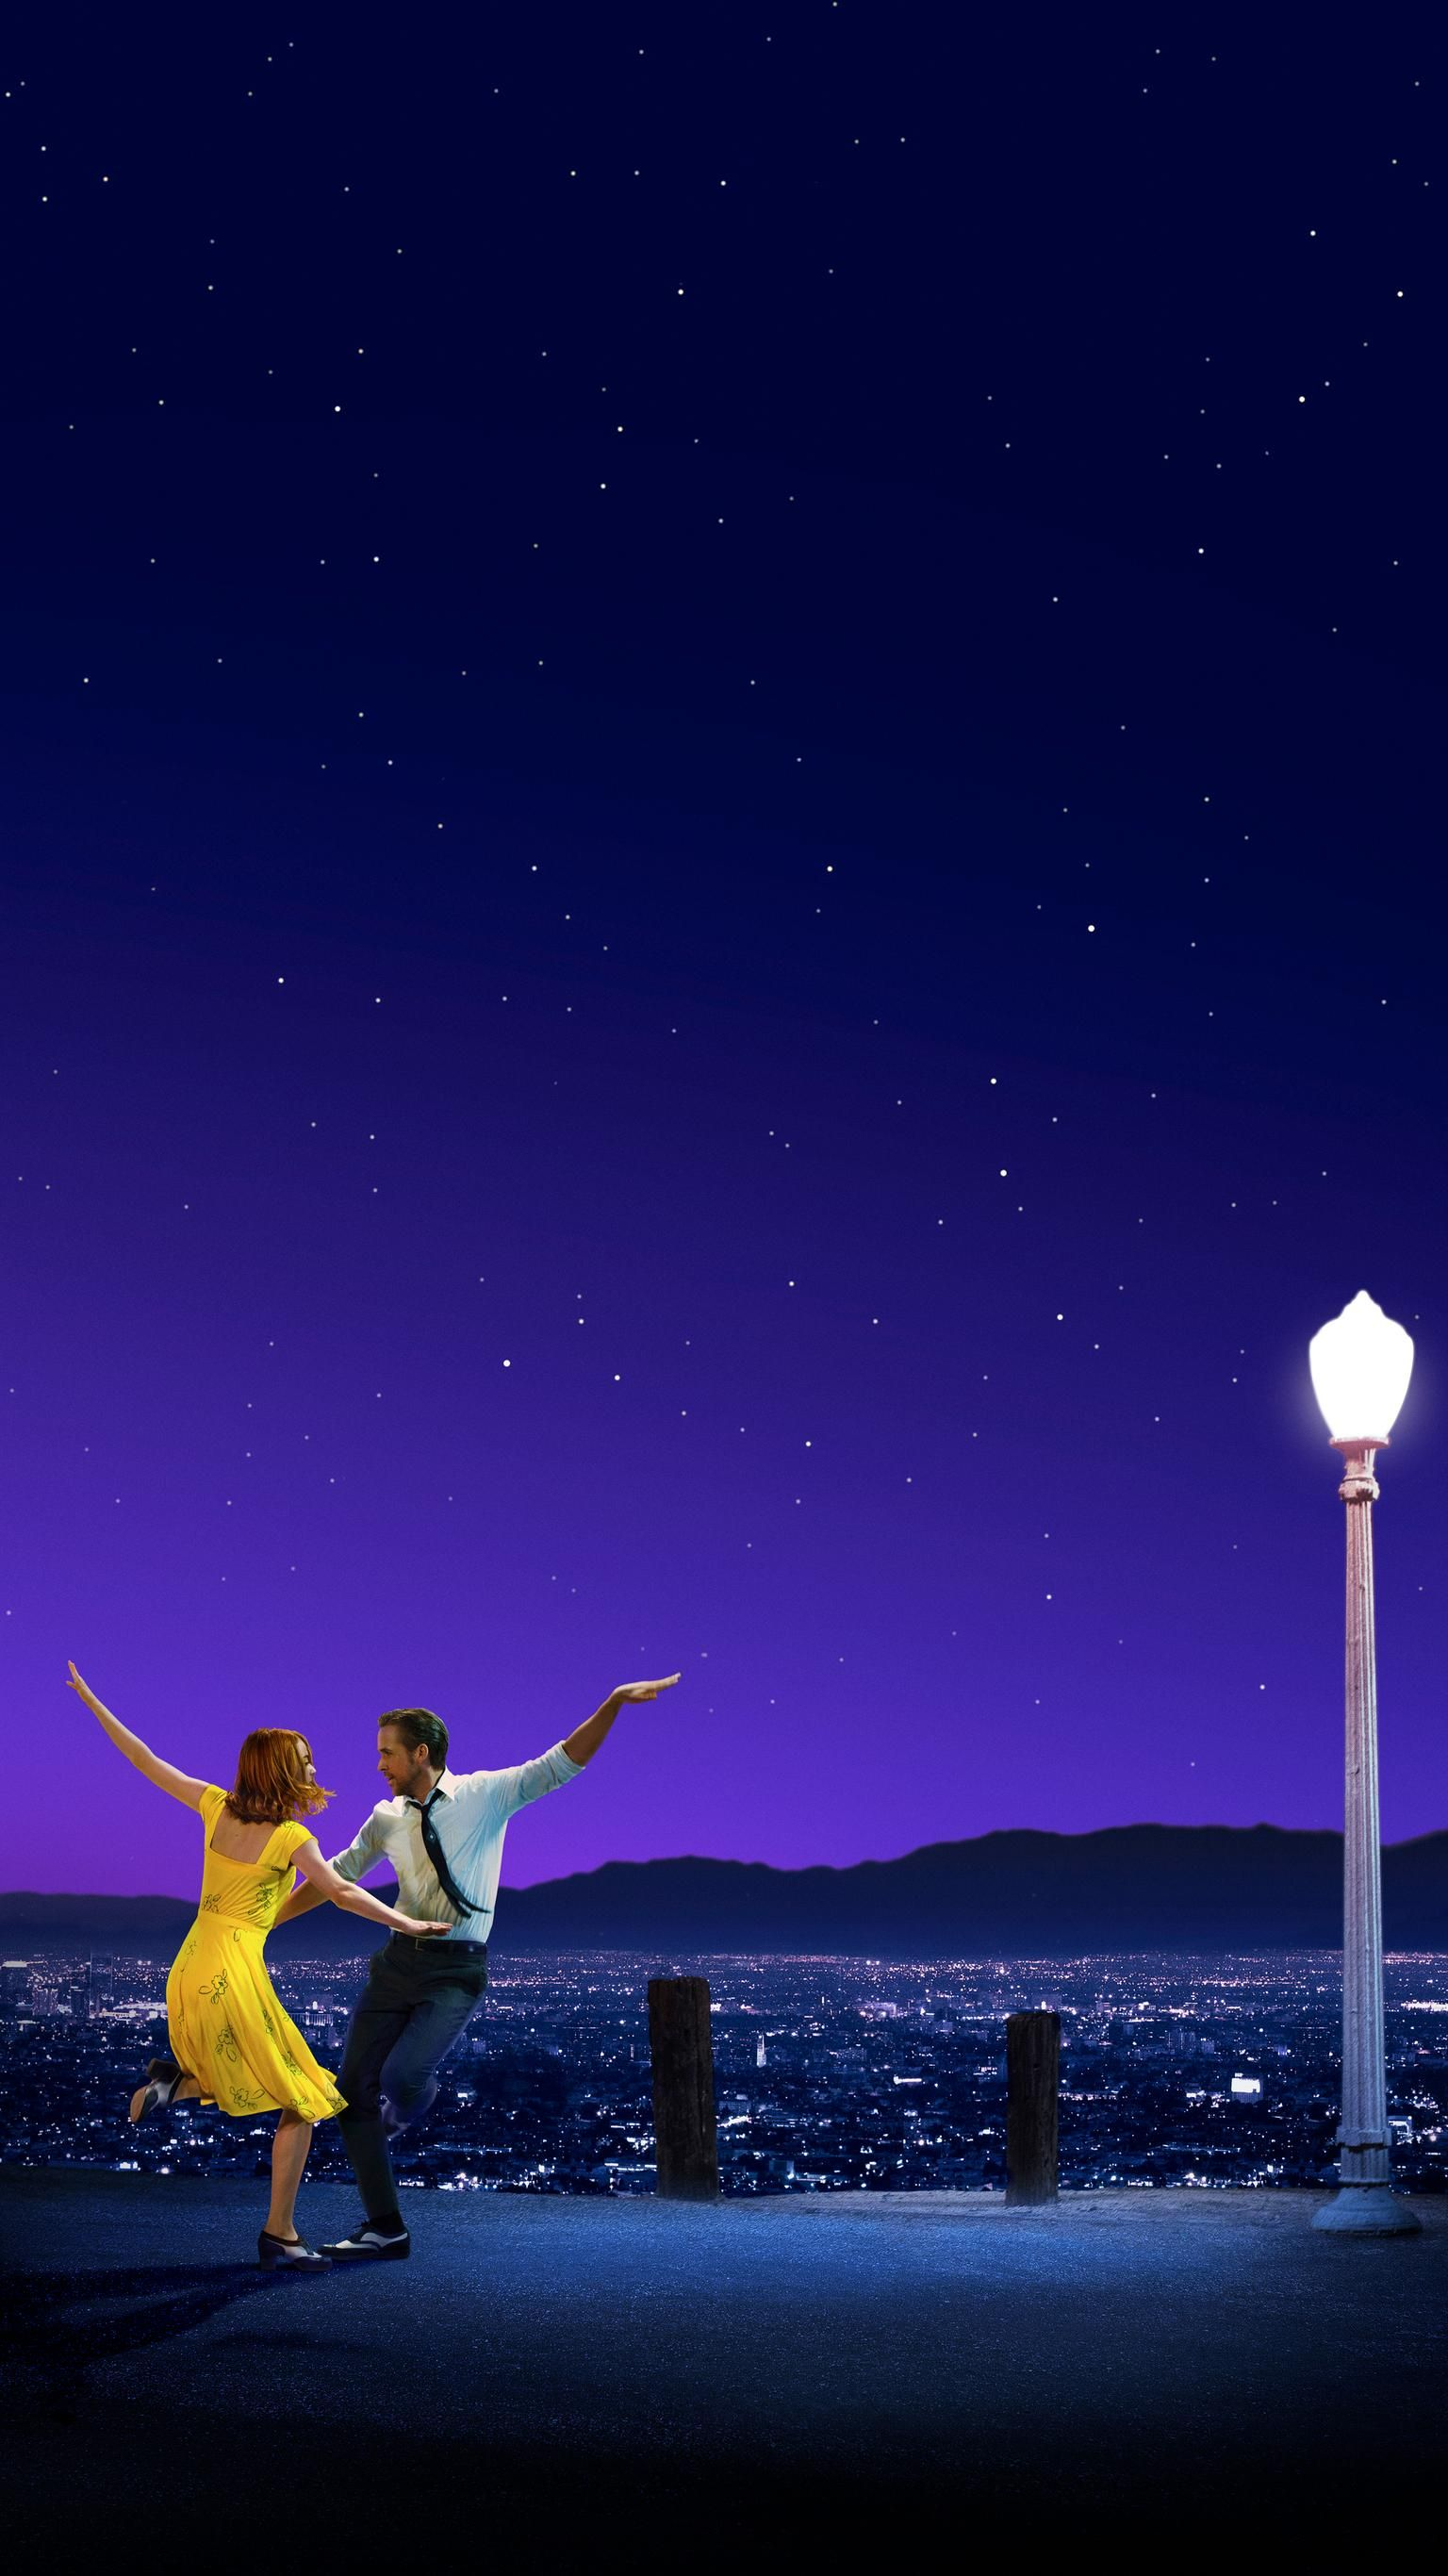 La La Land 16 Phone Wallpaper ララランド 映画 フライヤー 壁紙